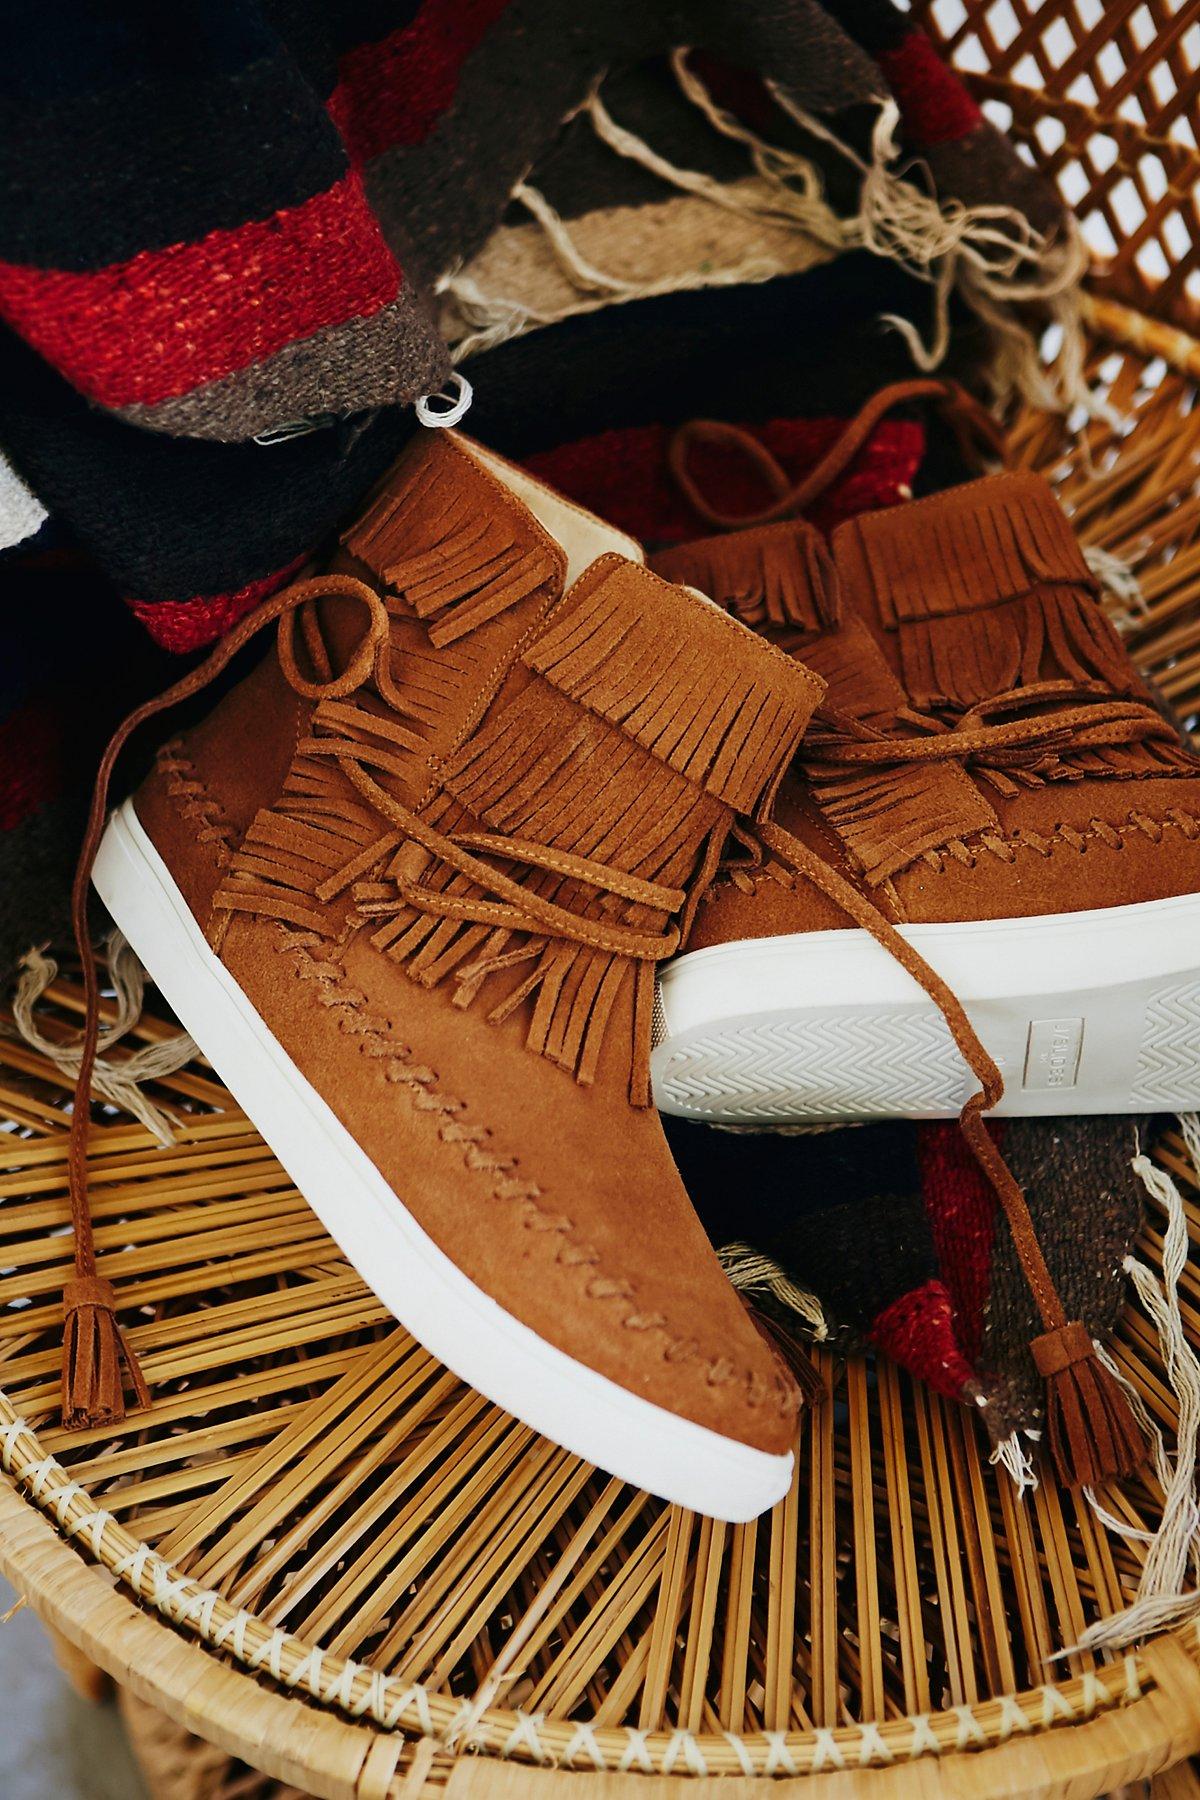 Bainbridge流苏运动鞋